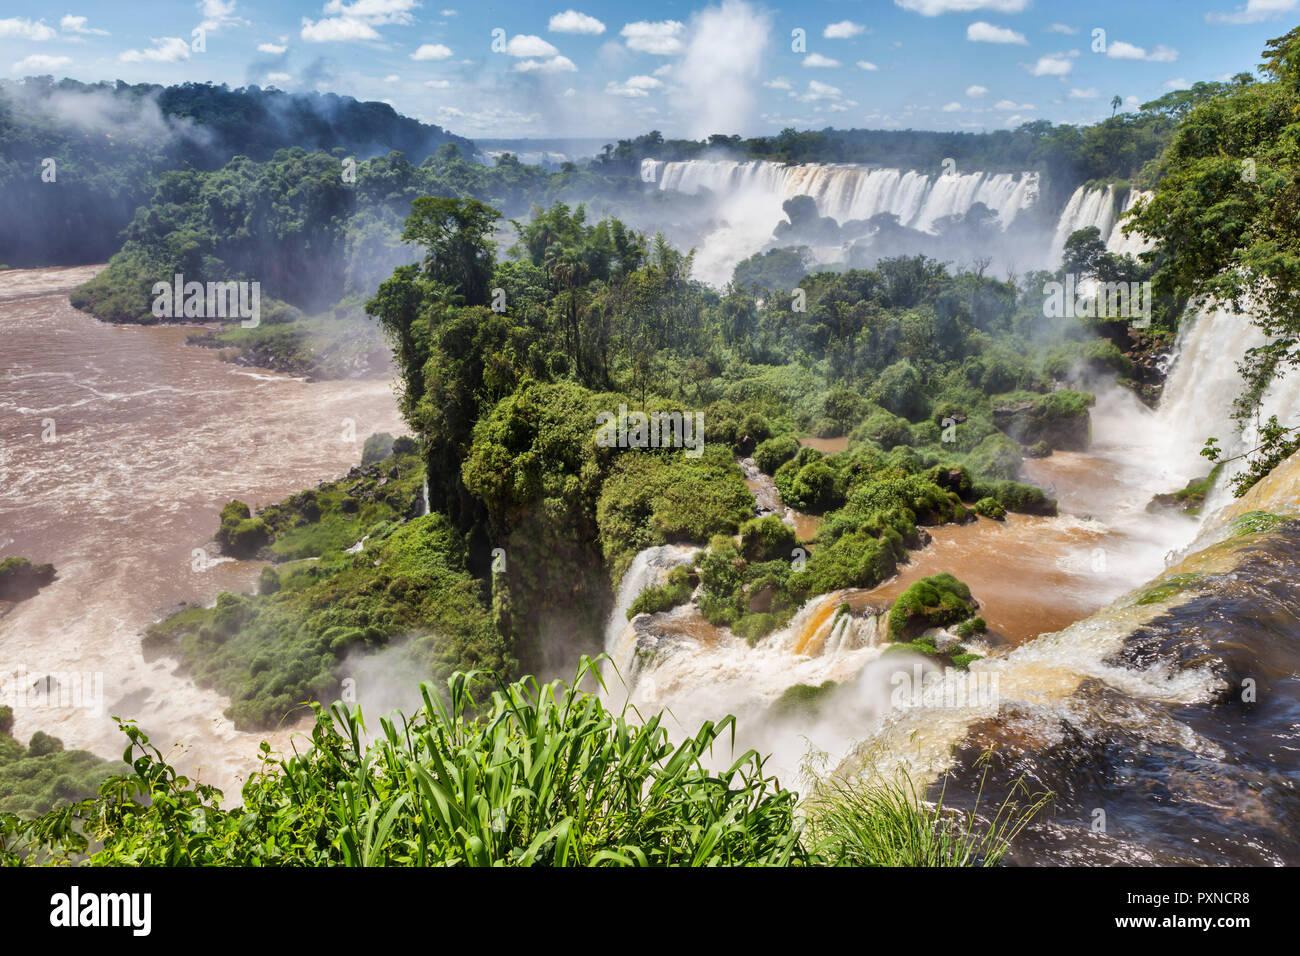 Cataratas del Iguazú, Puerto Iguazú, Misiones, Argentina Imagen De Stock